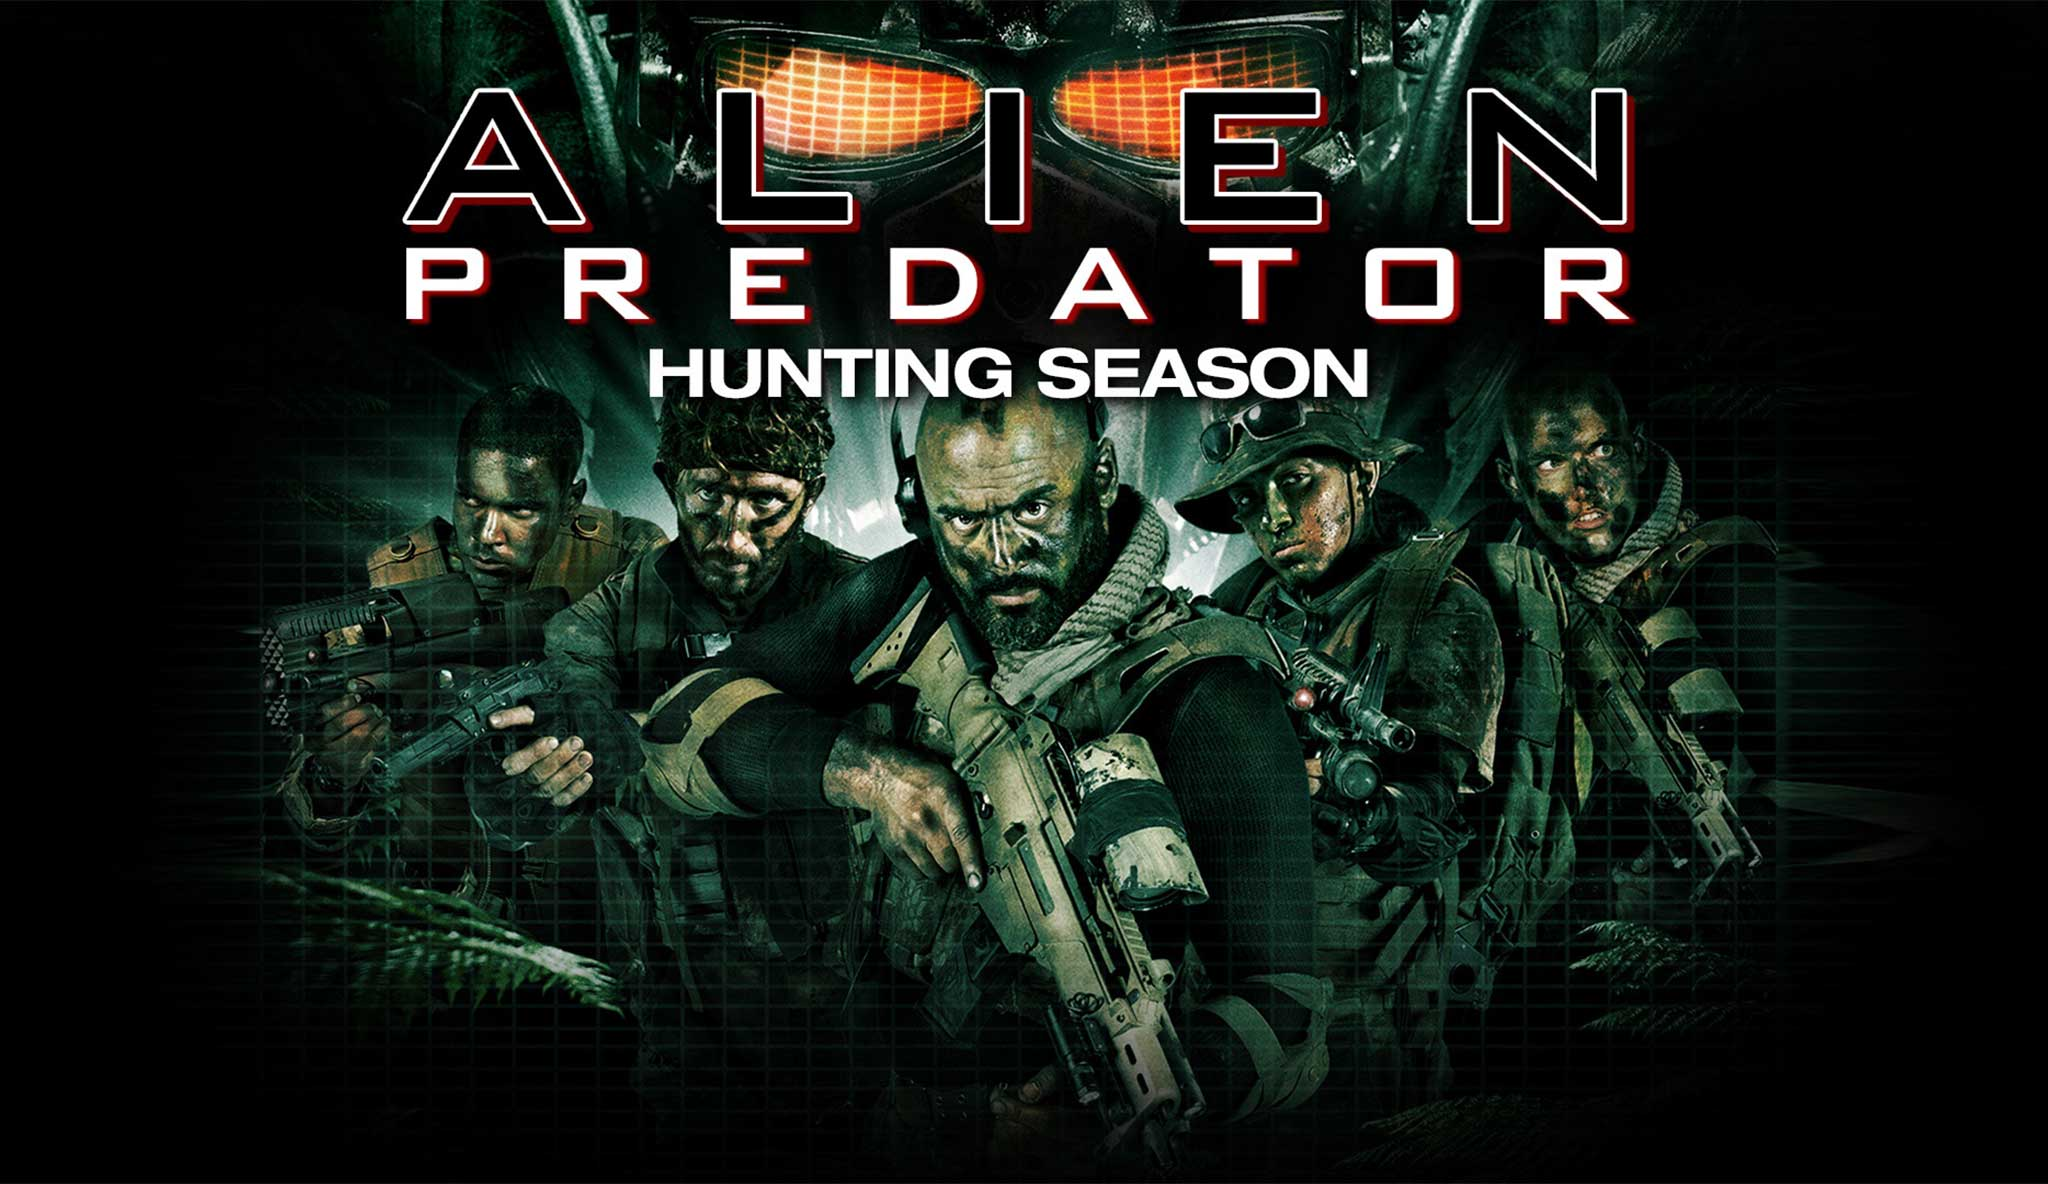 alien-predator-hunting-season\header.jpg